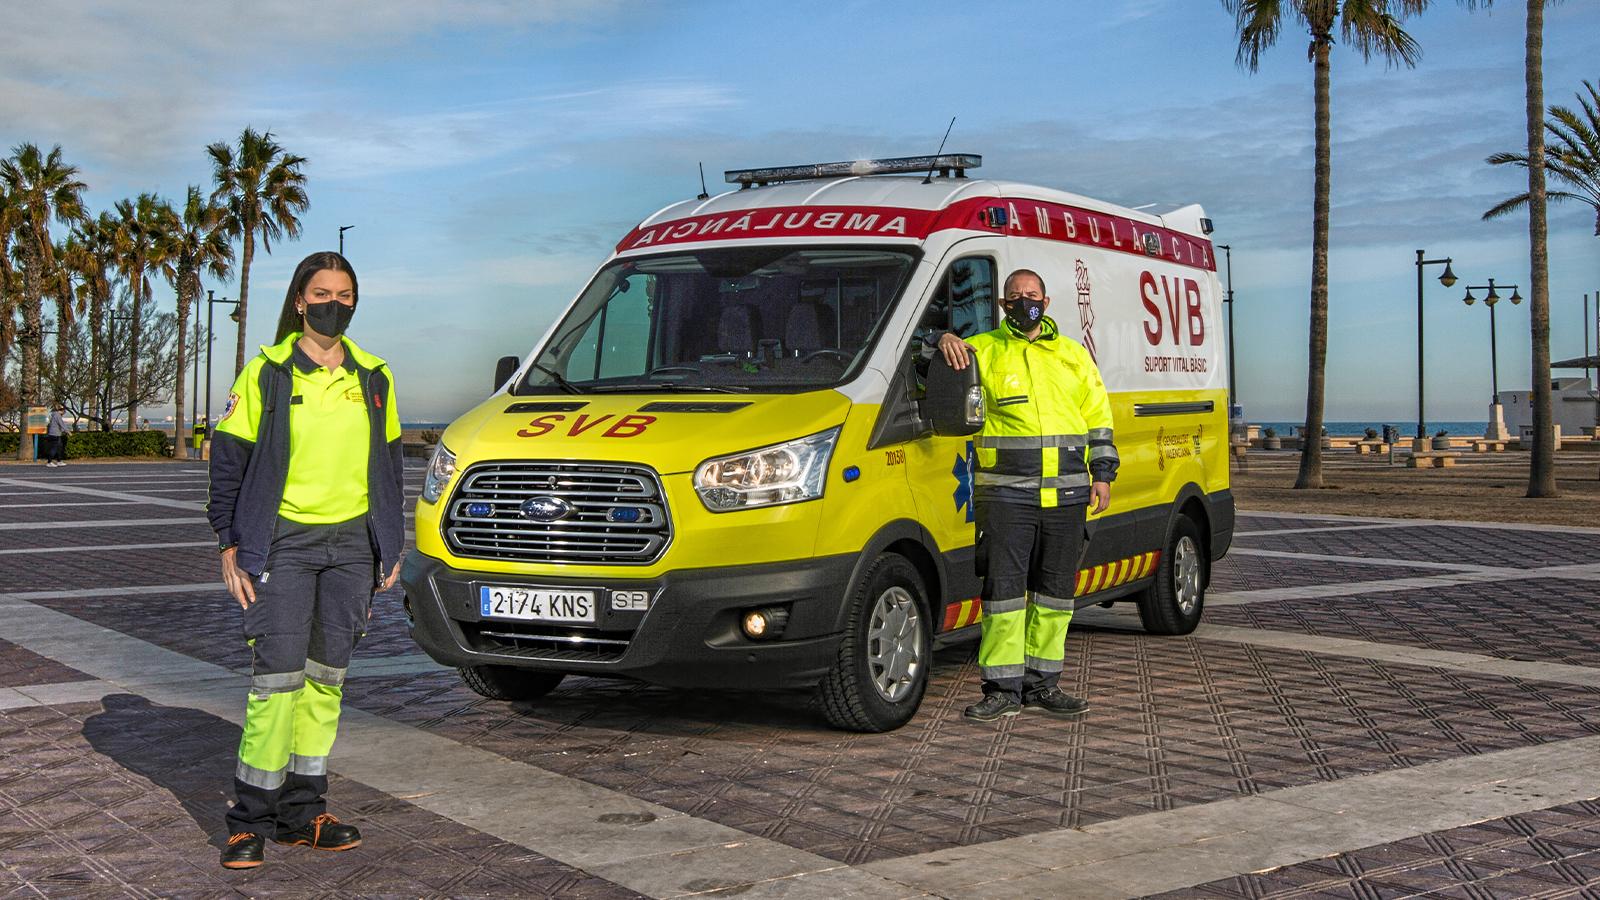 Ford LifeSavers Spain Shot 01 16 9 1 Lifesavers : Η νέα σειρά βίντεο, προβάλλει τους ήρωες των υπηρεσιών έκτακτης ανάγκης στην Ευρώπη Ford, zblog, ειδήσεις